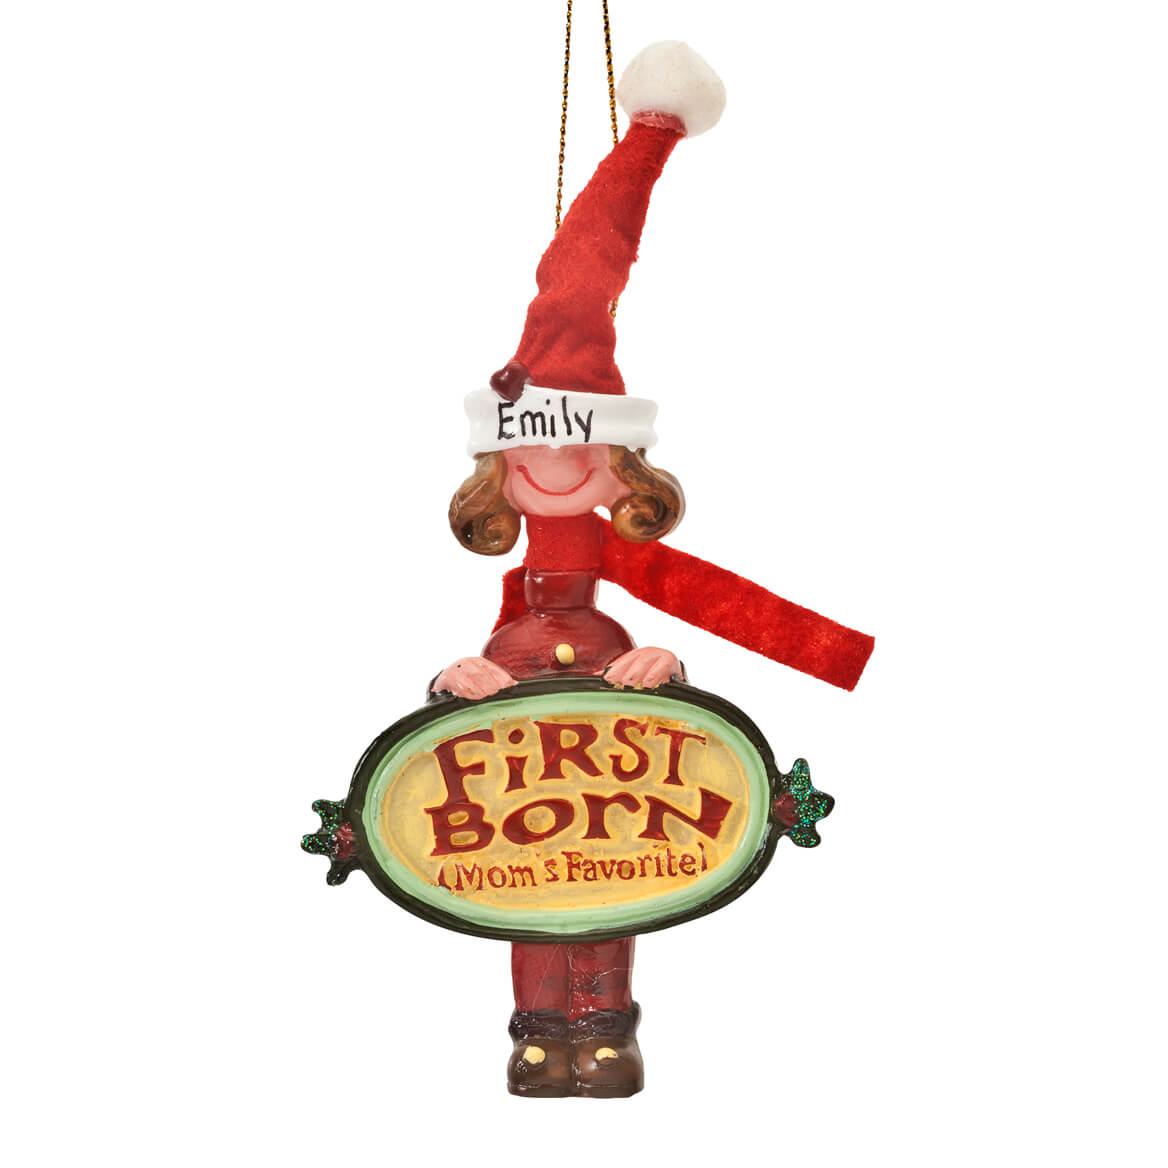 Personalized Mom's Favorite First Born Ornament-353218